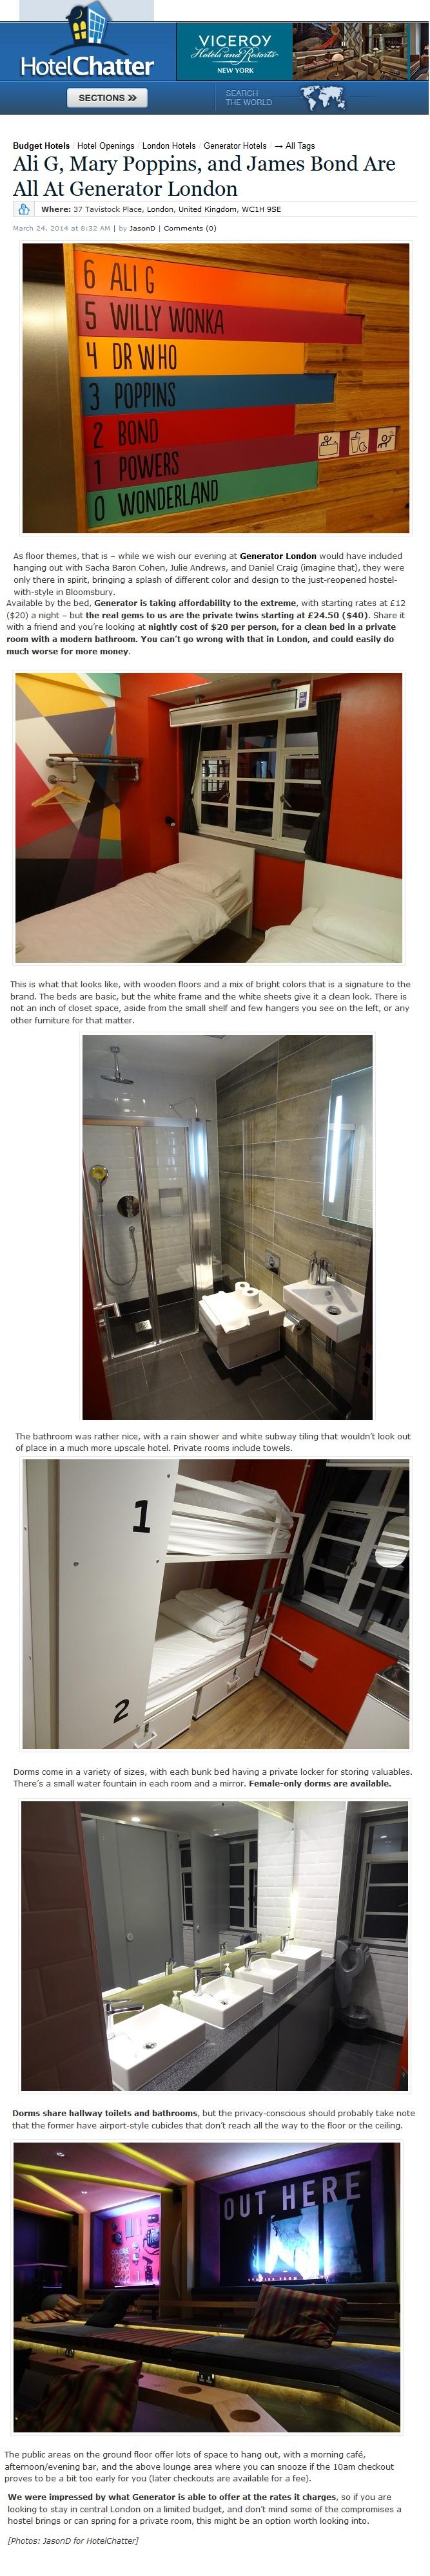 Patron capital latest news 28 mar 2014 generator london hotel chatter march 2014 jpg malvernweather Choice Image